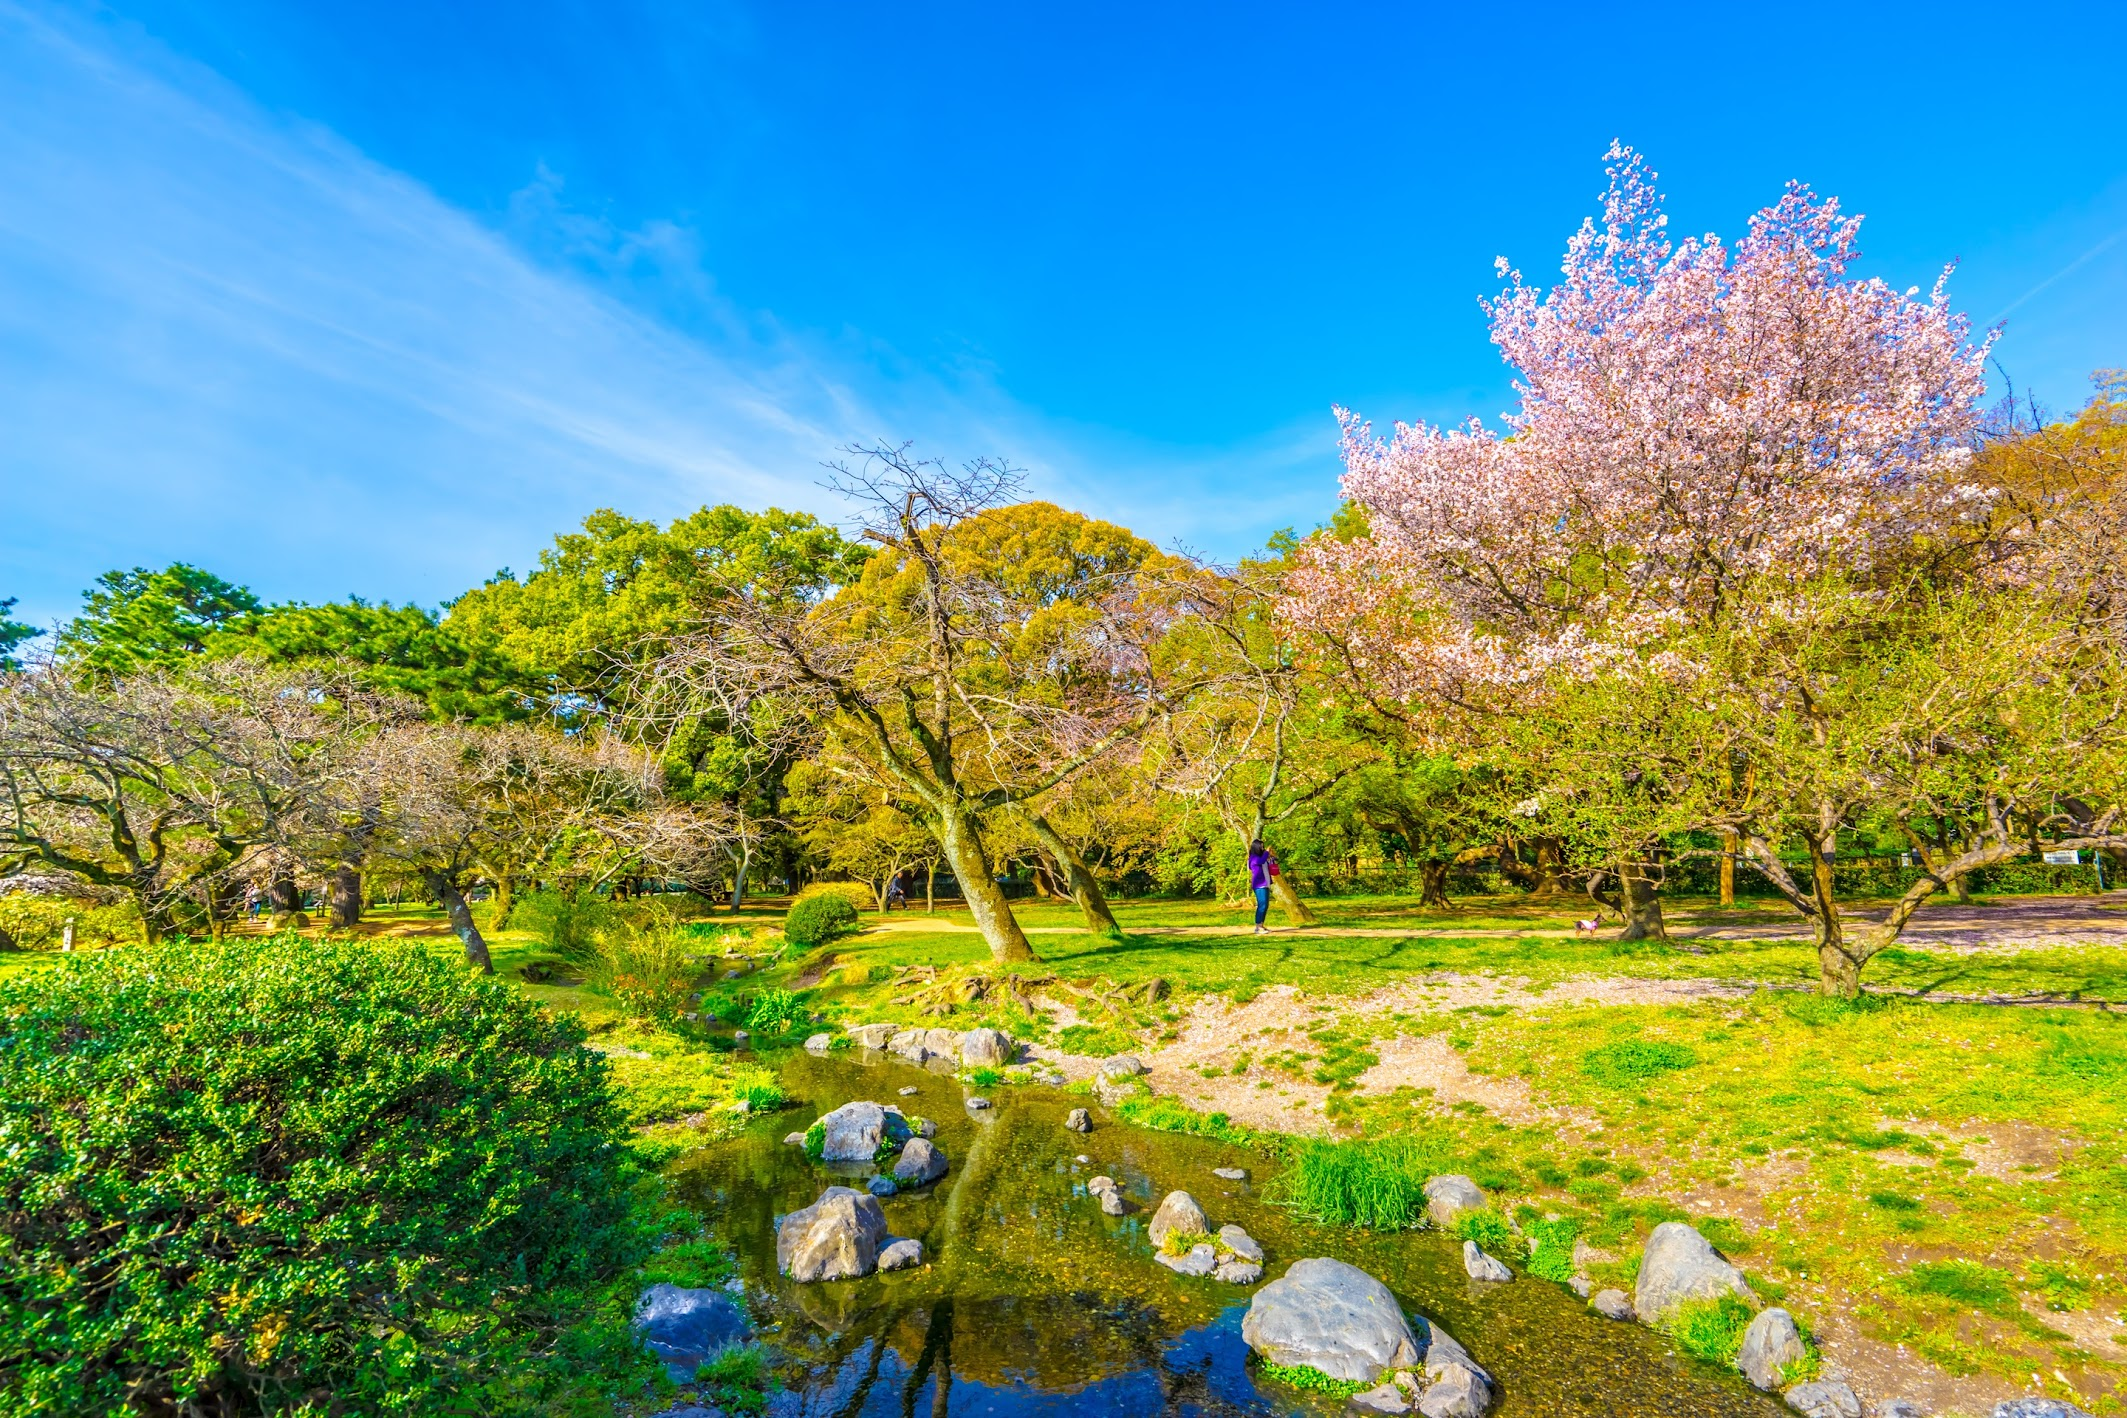 京都御苑 出水の小川 桜